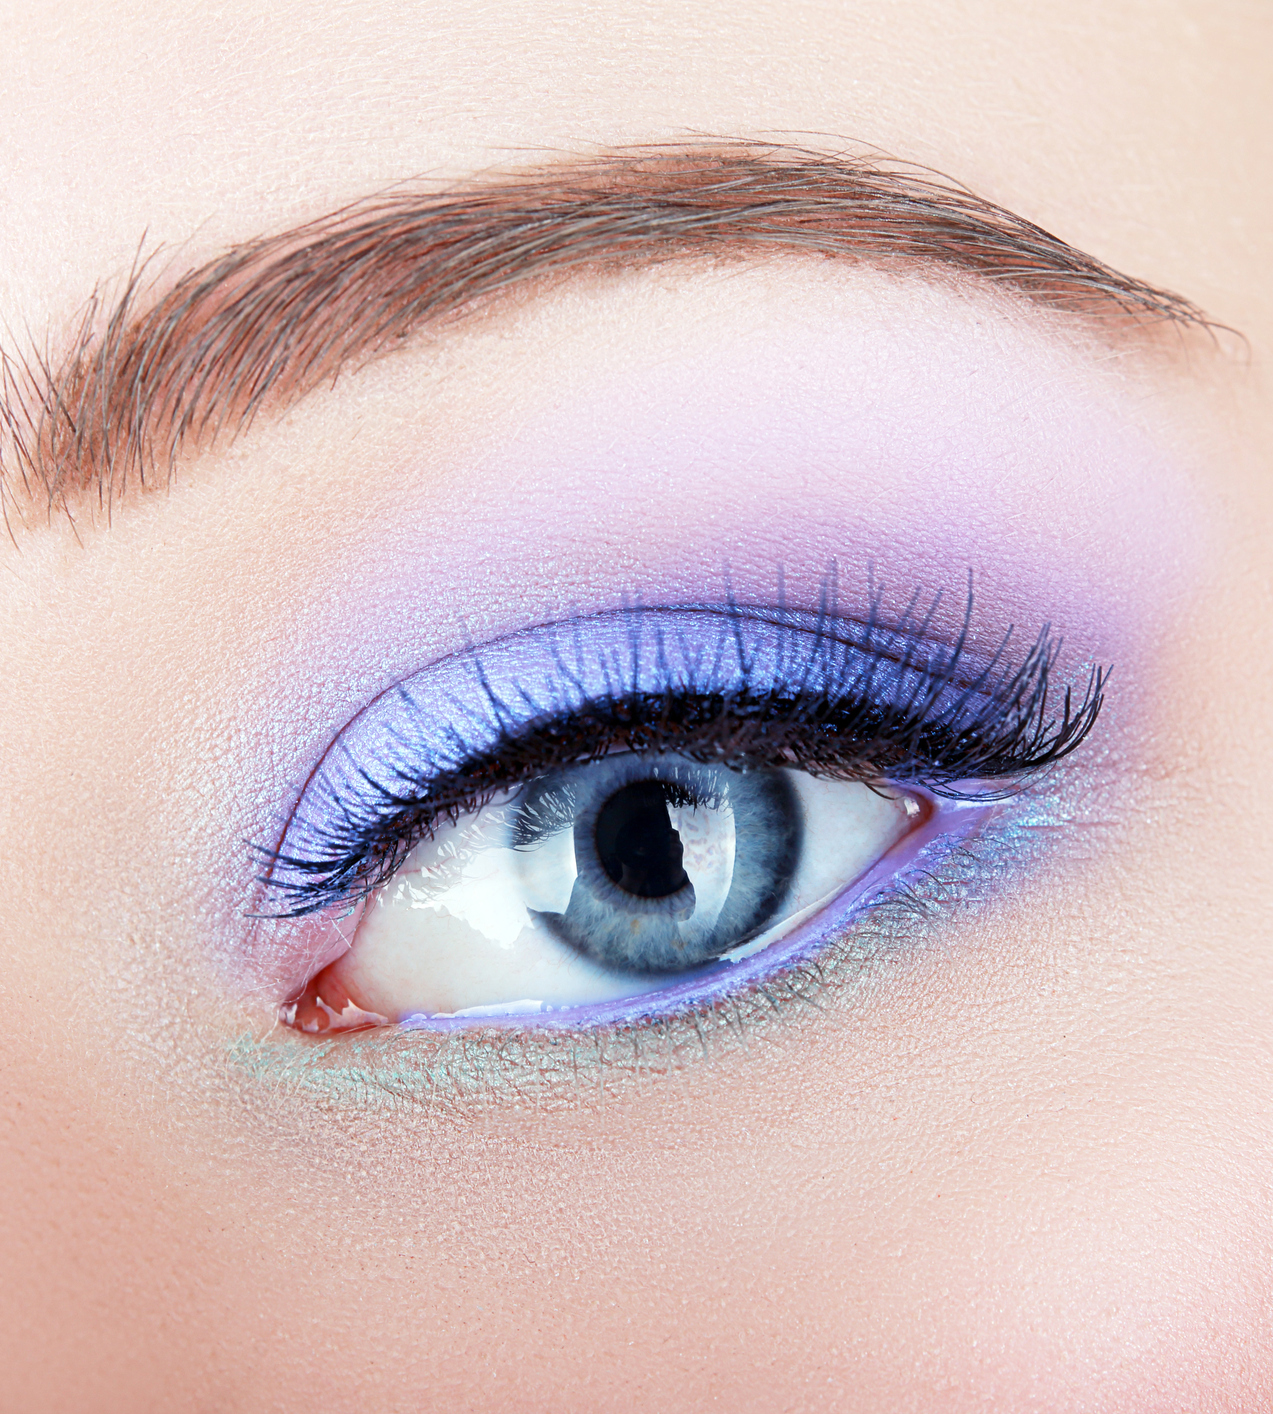 eye1_primarycrop.jpg